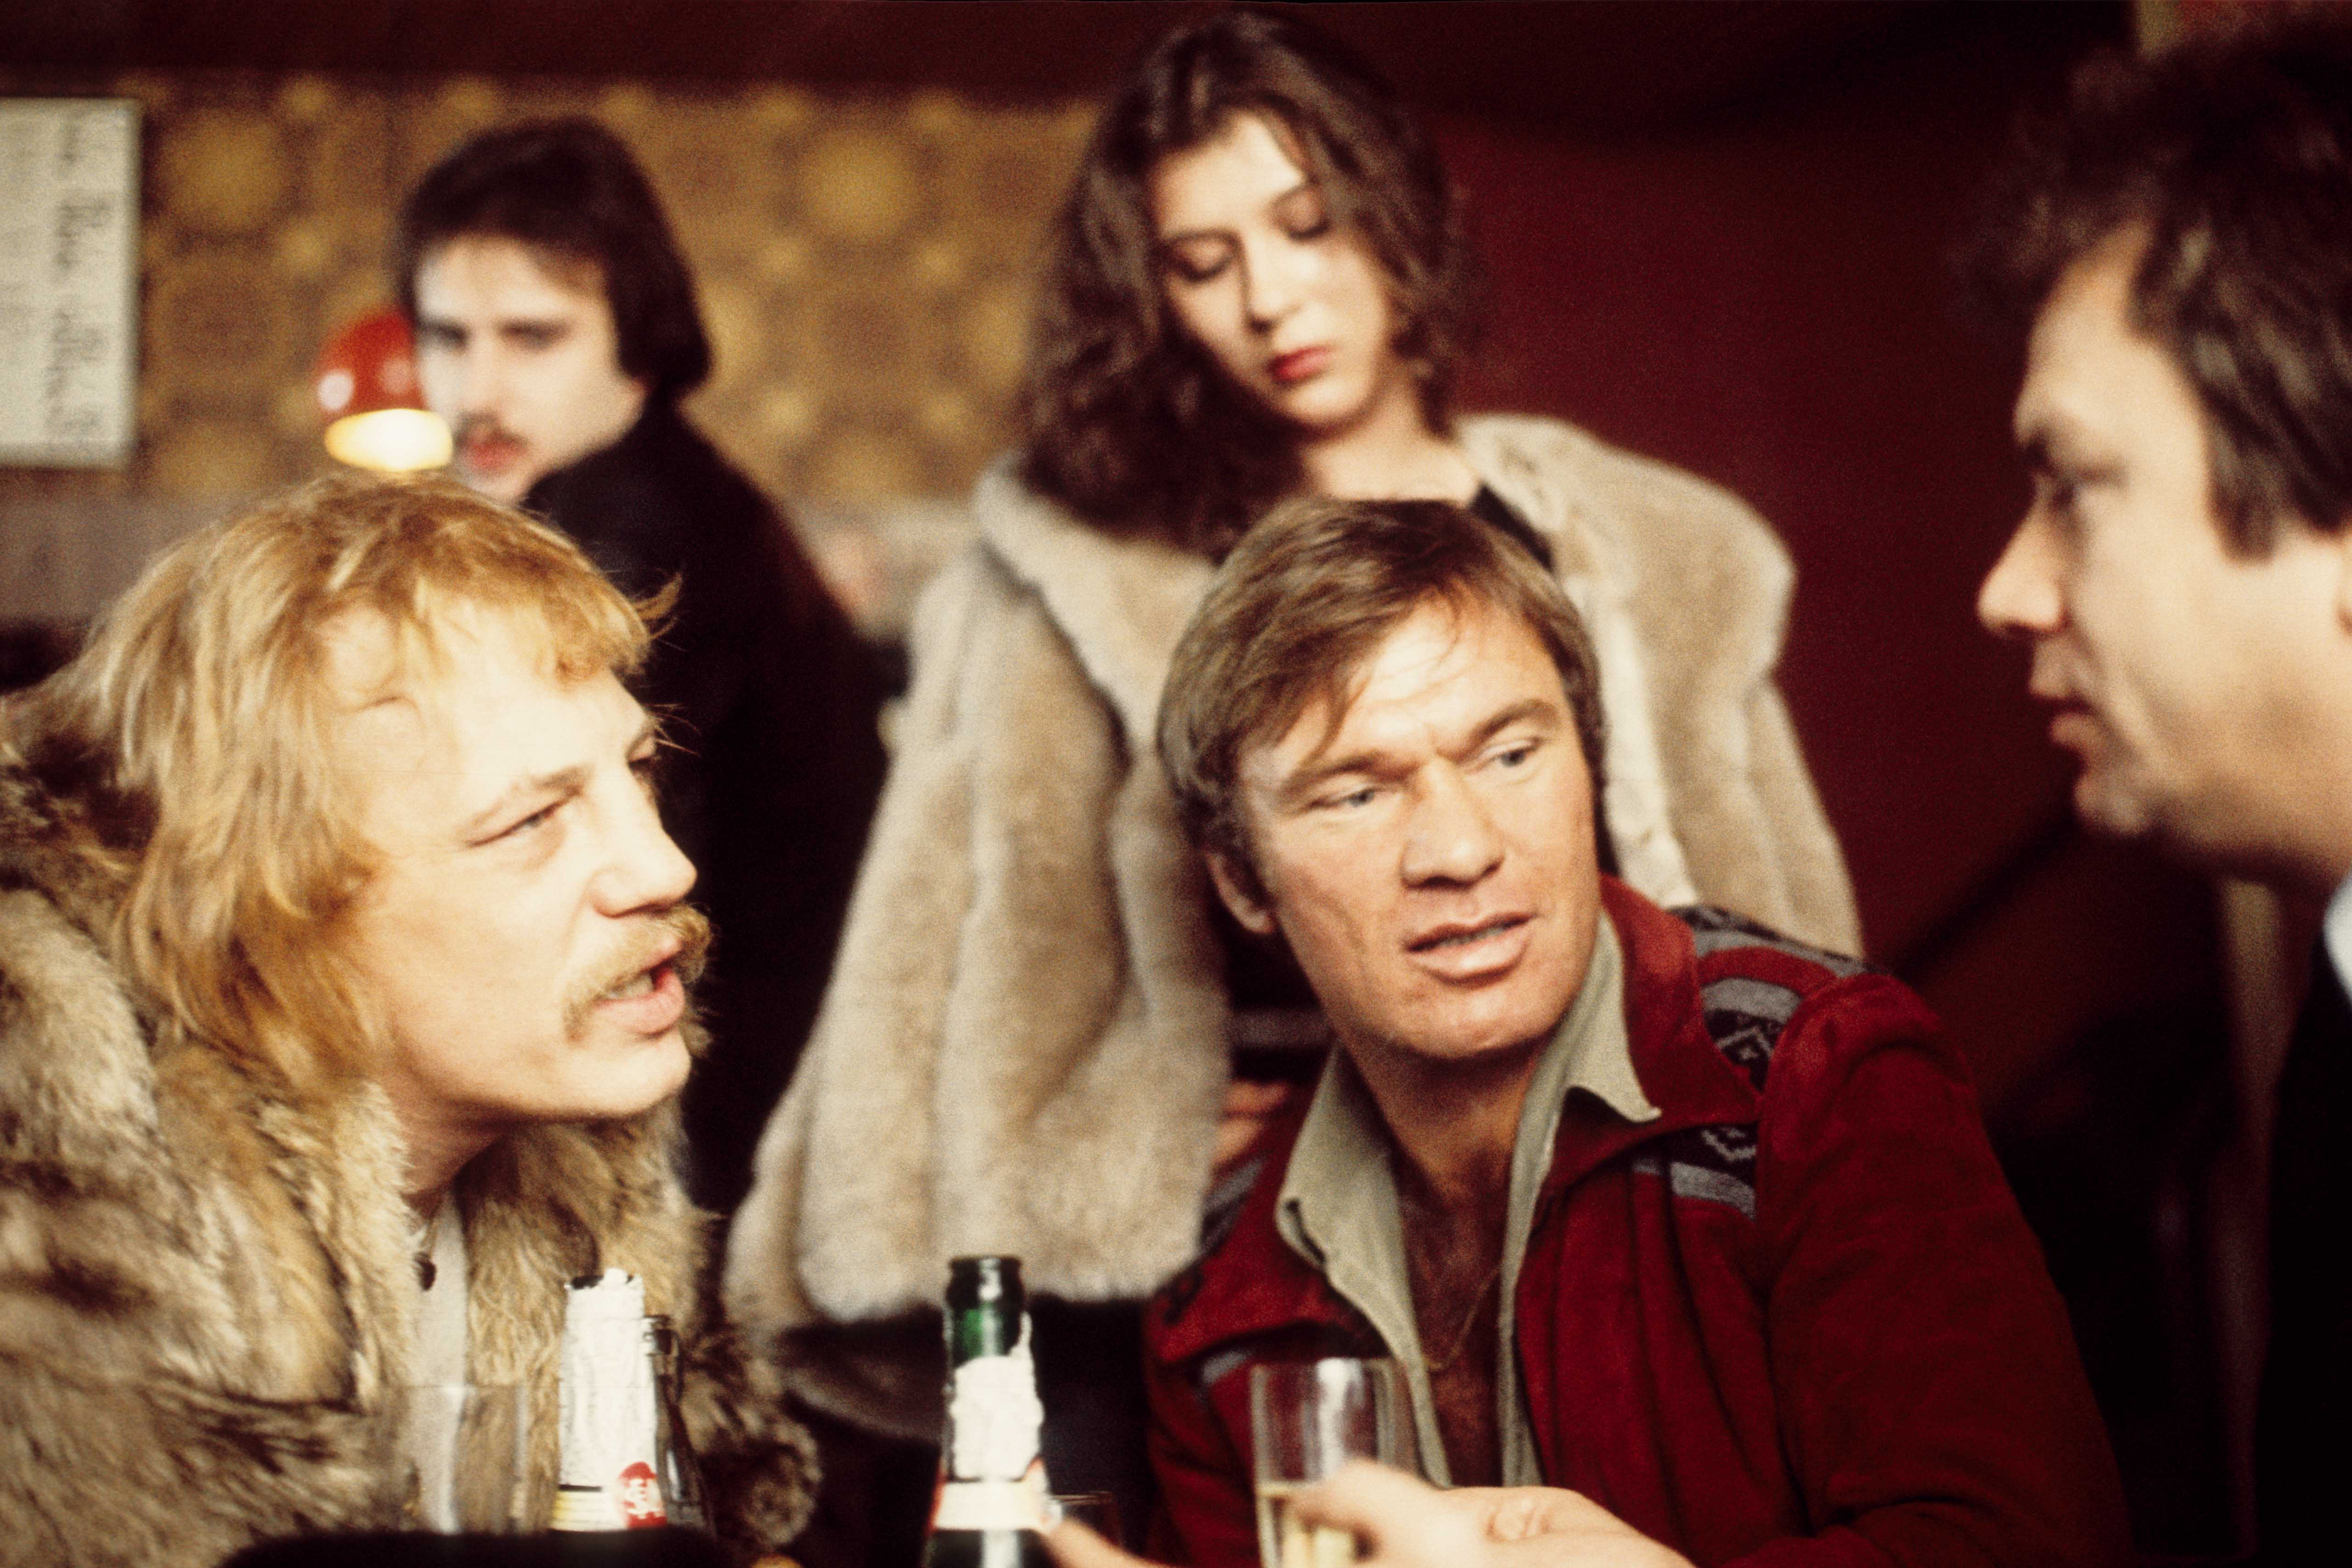 Still from the film Stroszek